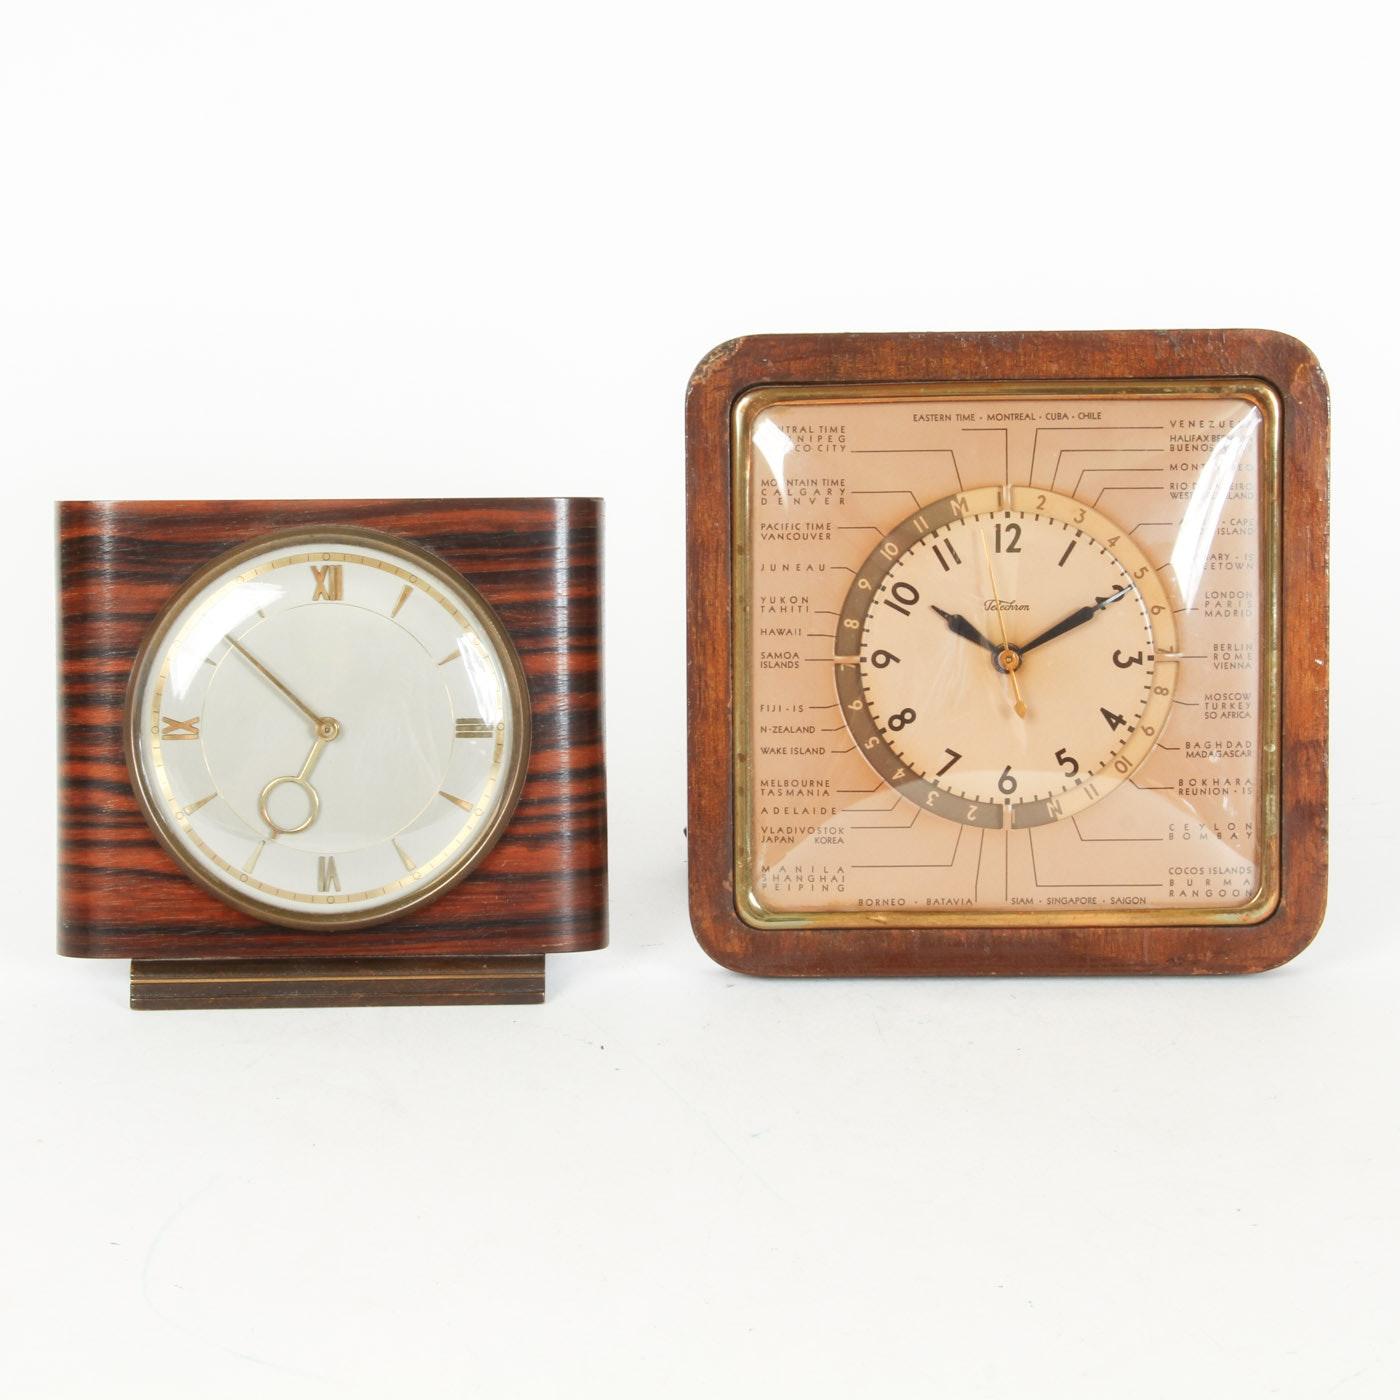 Kienzle Art Deco Wood Table Clock and a Telechron Wood Table Clock